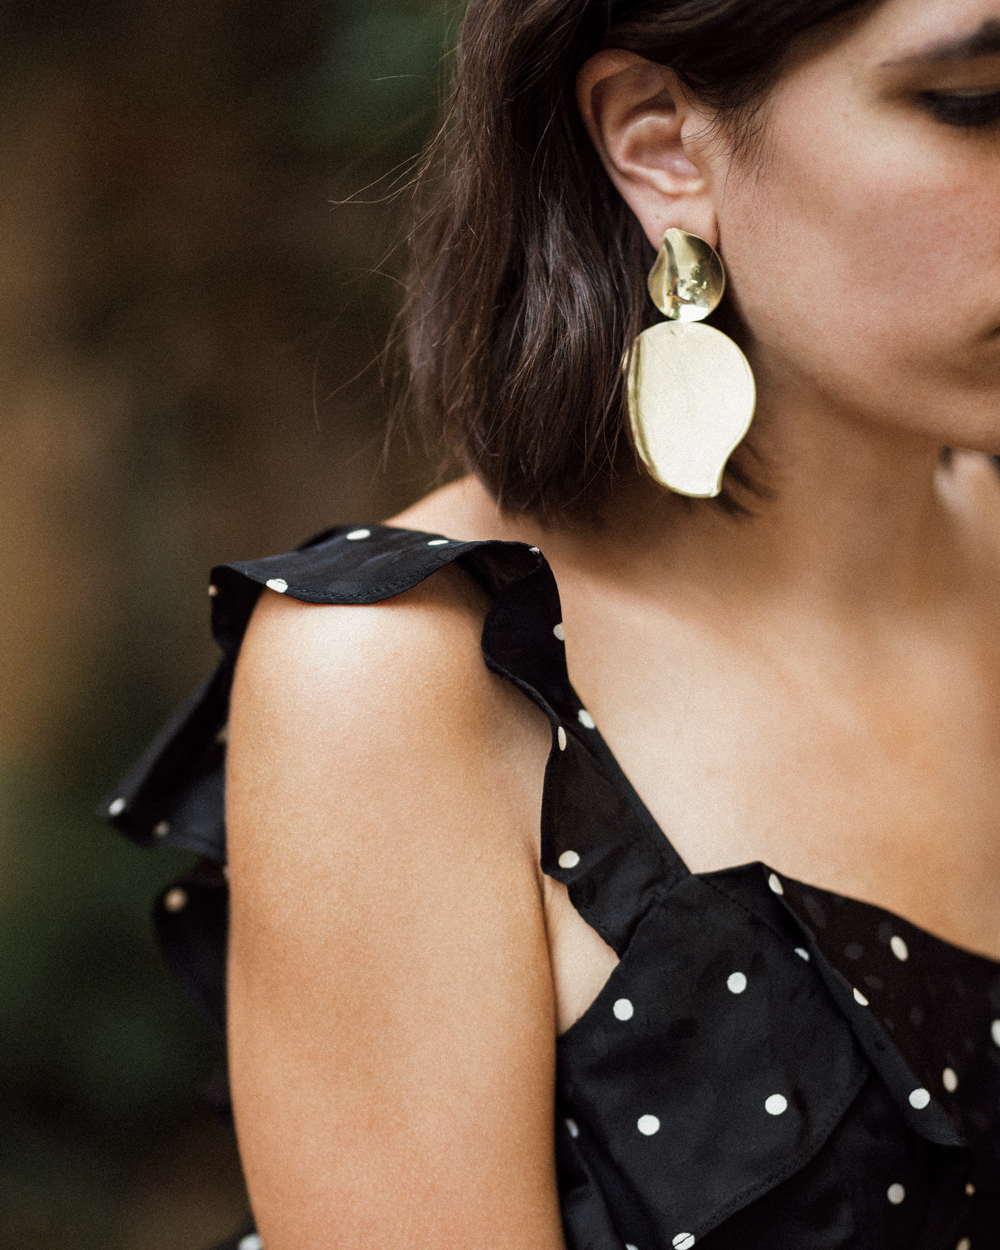 How to wear a polka dot dress in 2017